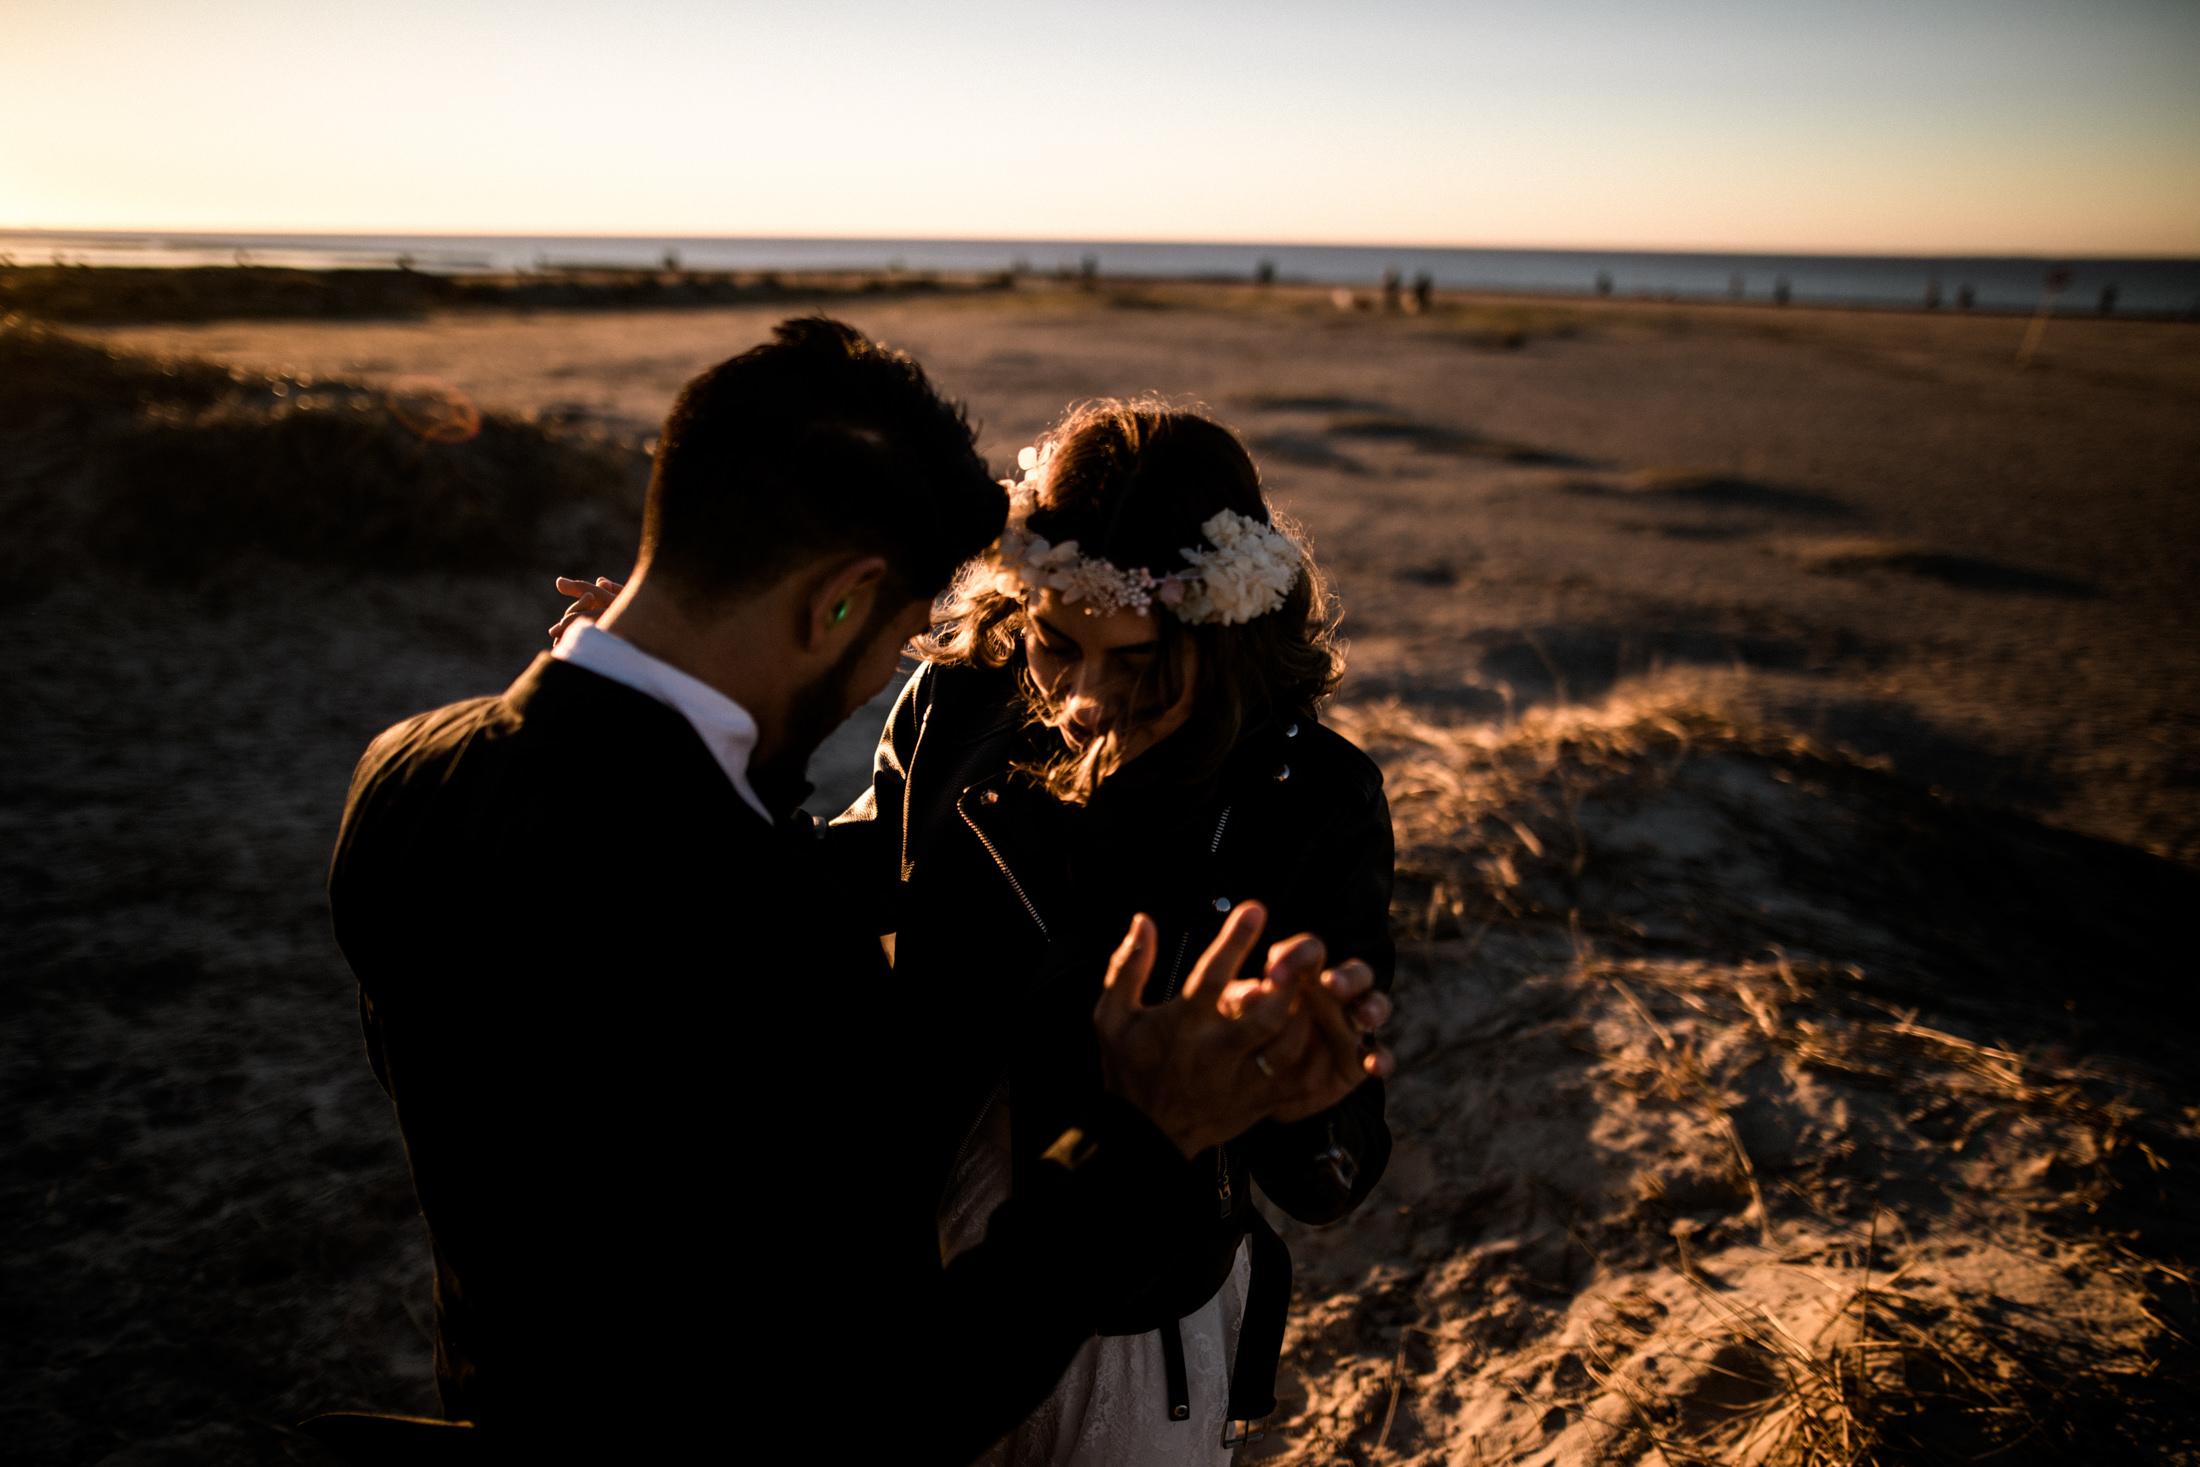 Wedding_Photographer_Mallorca_Daniela-Marquardt_Photography_CanaryIslands_Lanzarote_Iceland_Tuskany_Santorini_Portugal_Schweiz_Austria_Bayern_Elopement_Hochzeitsfotograf_Norddeichich_23